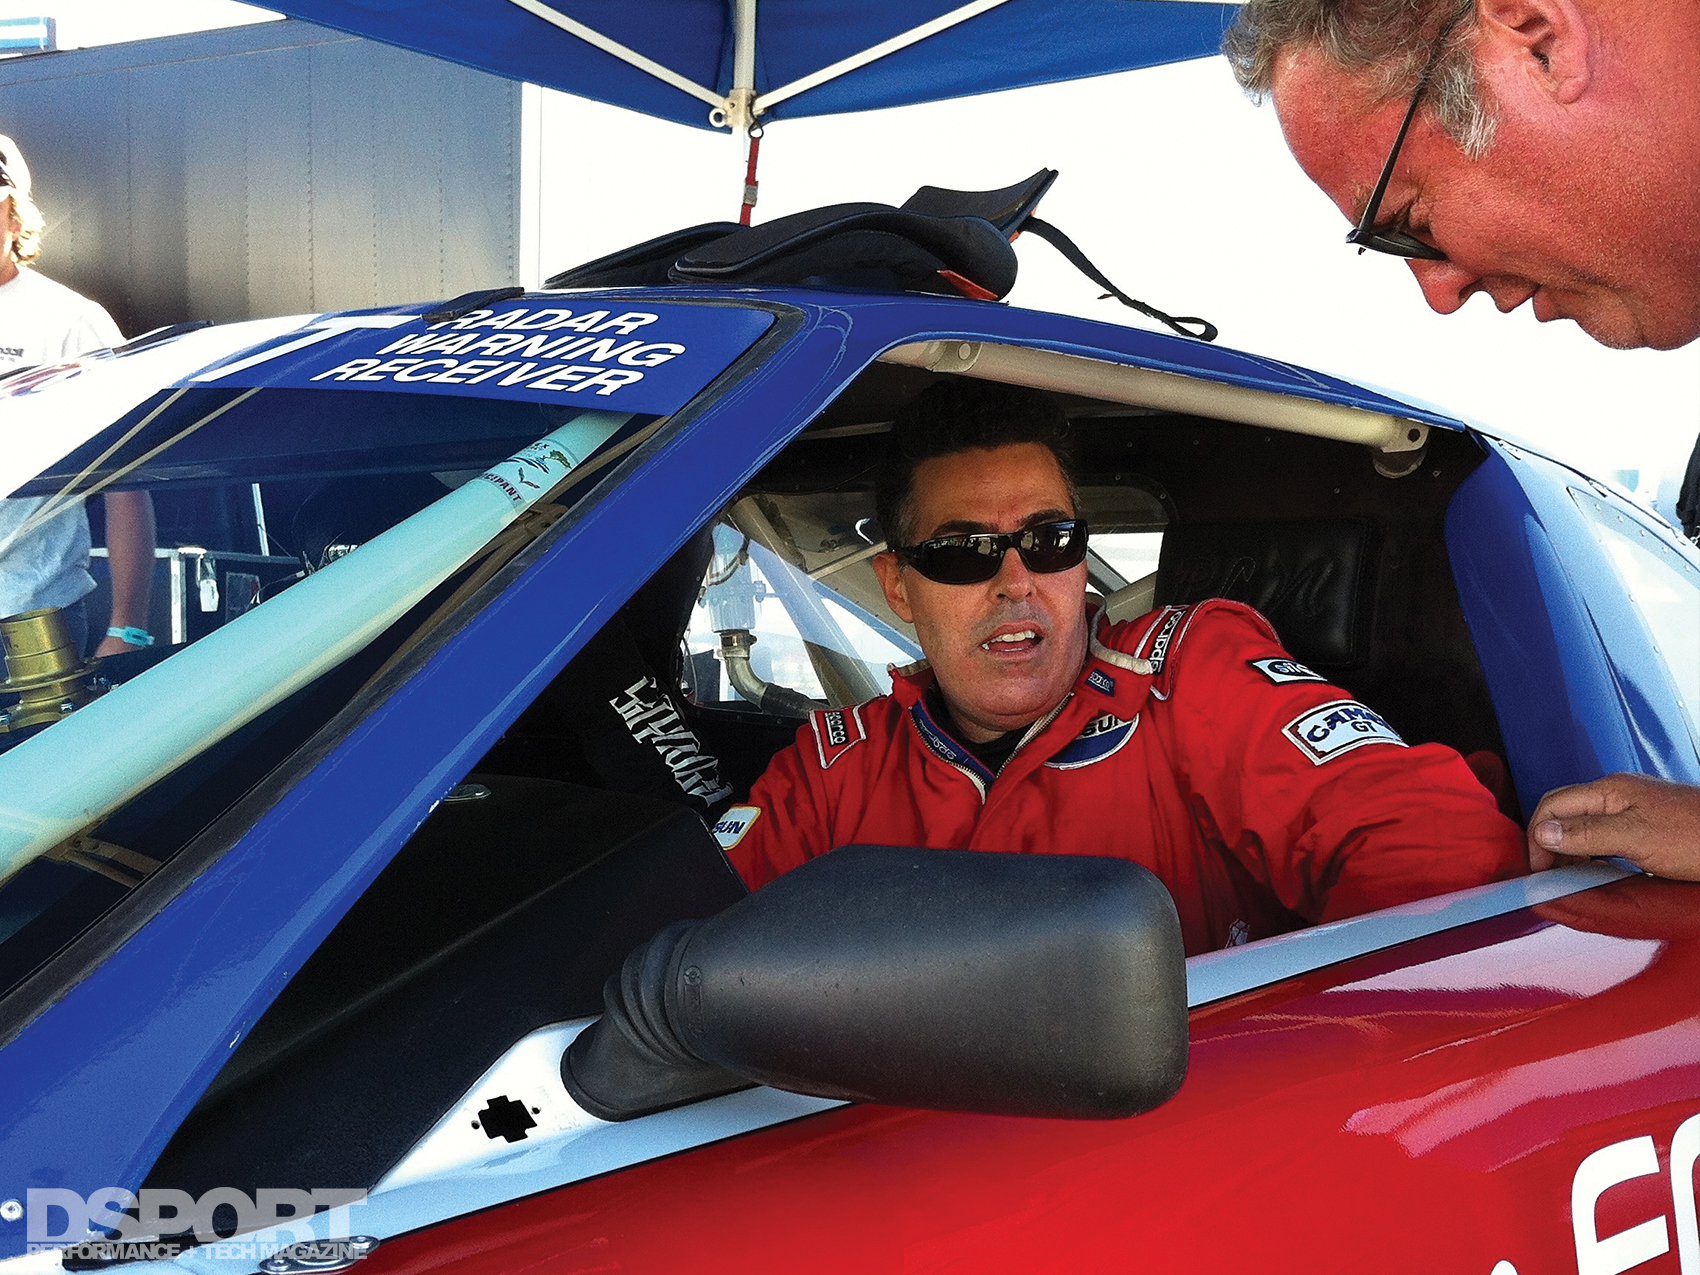 Paul Newman S Datsun 200sx Racecar Returns To The Tarmac